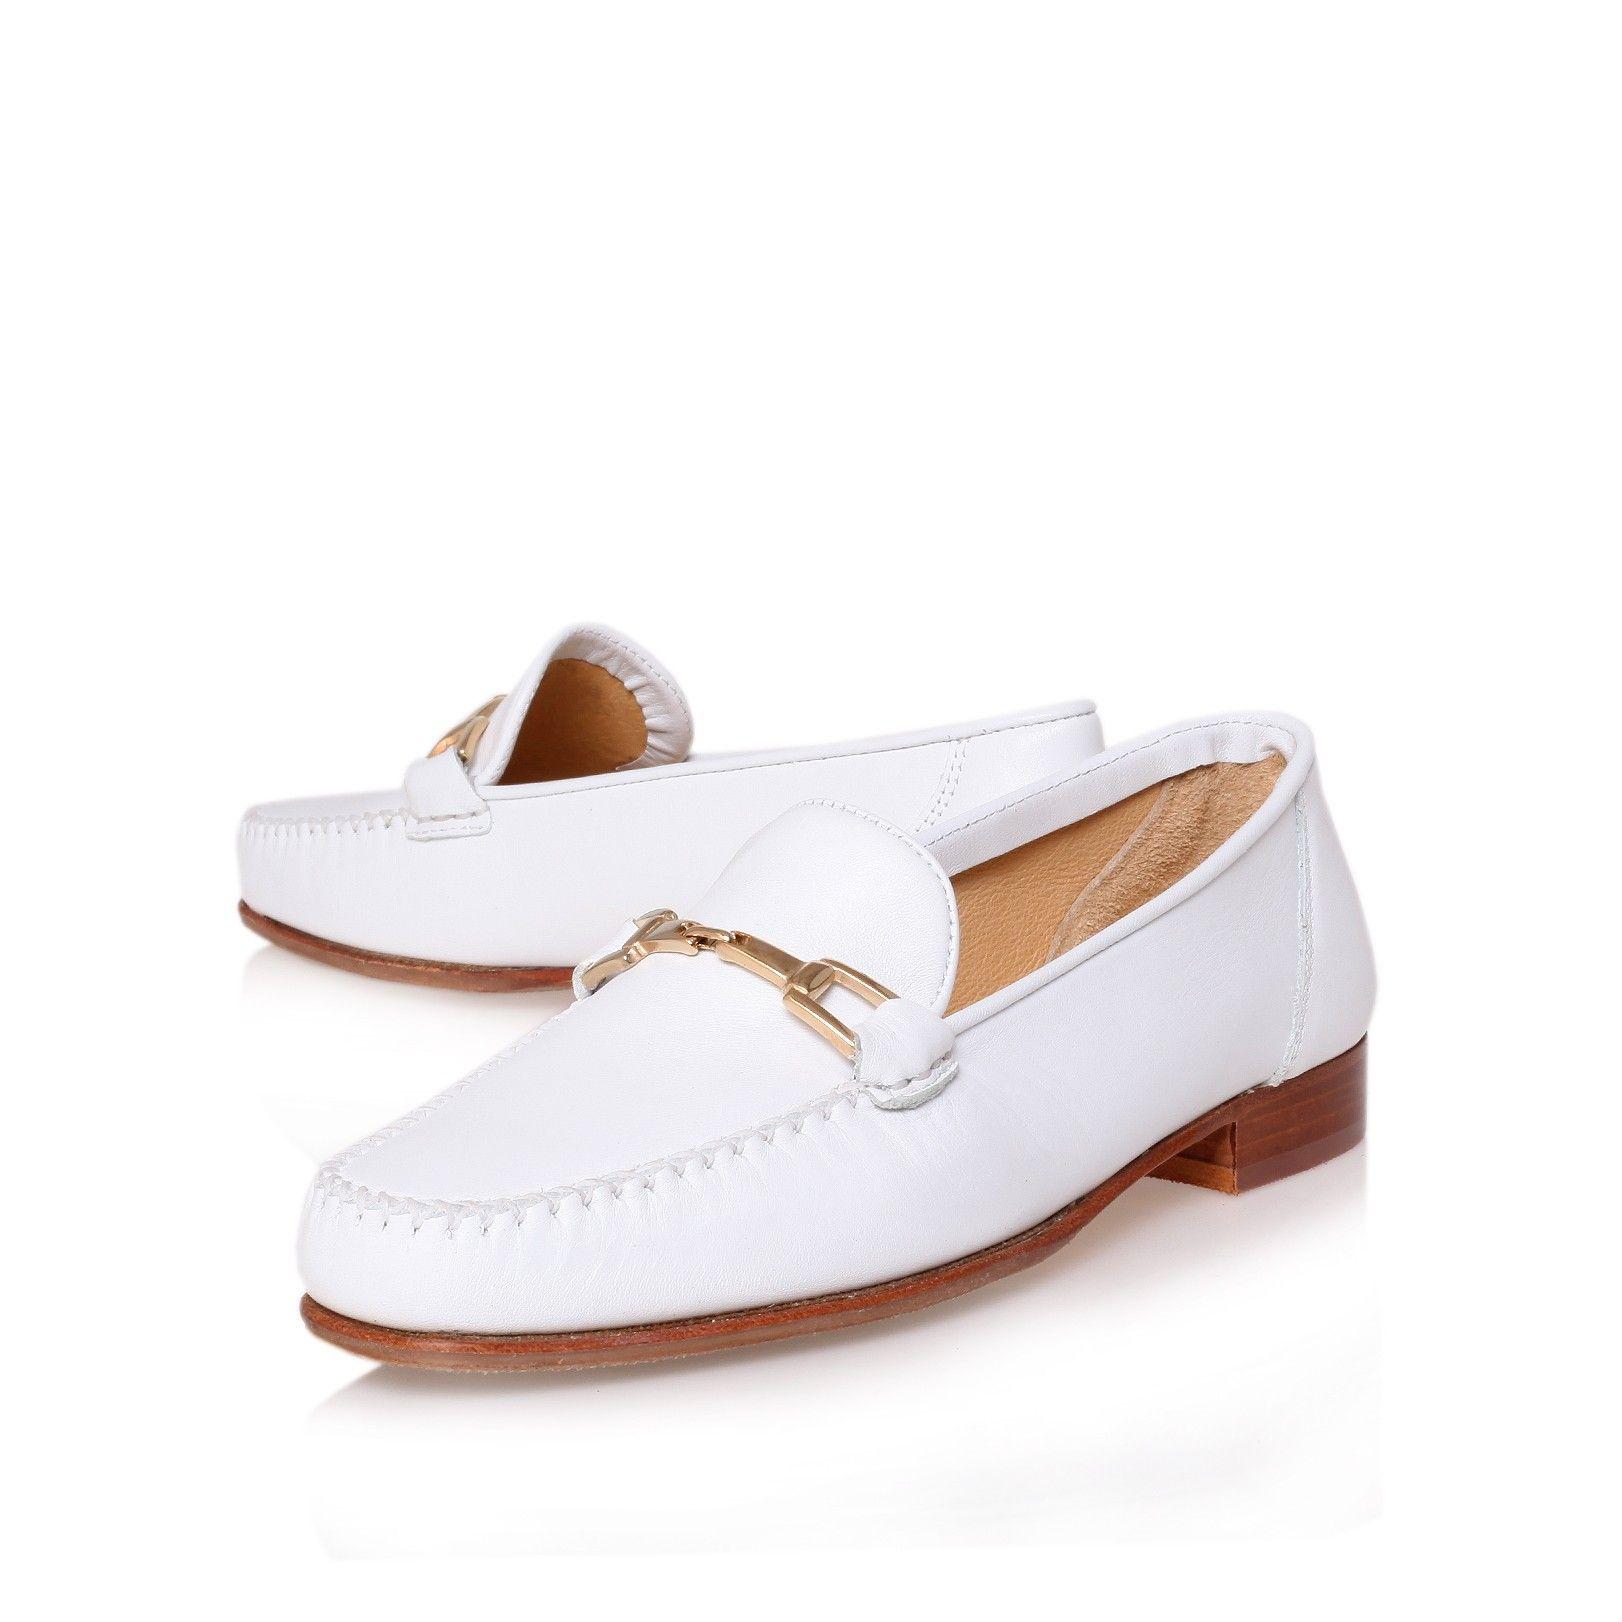 carvela shoes boys. mariner white flat loafer shoes from carvela kurt geiger boys c